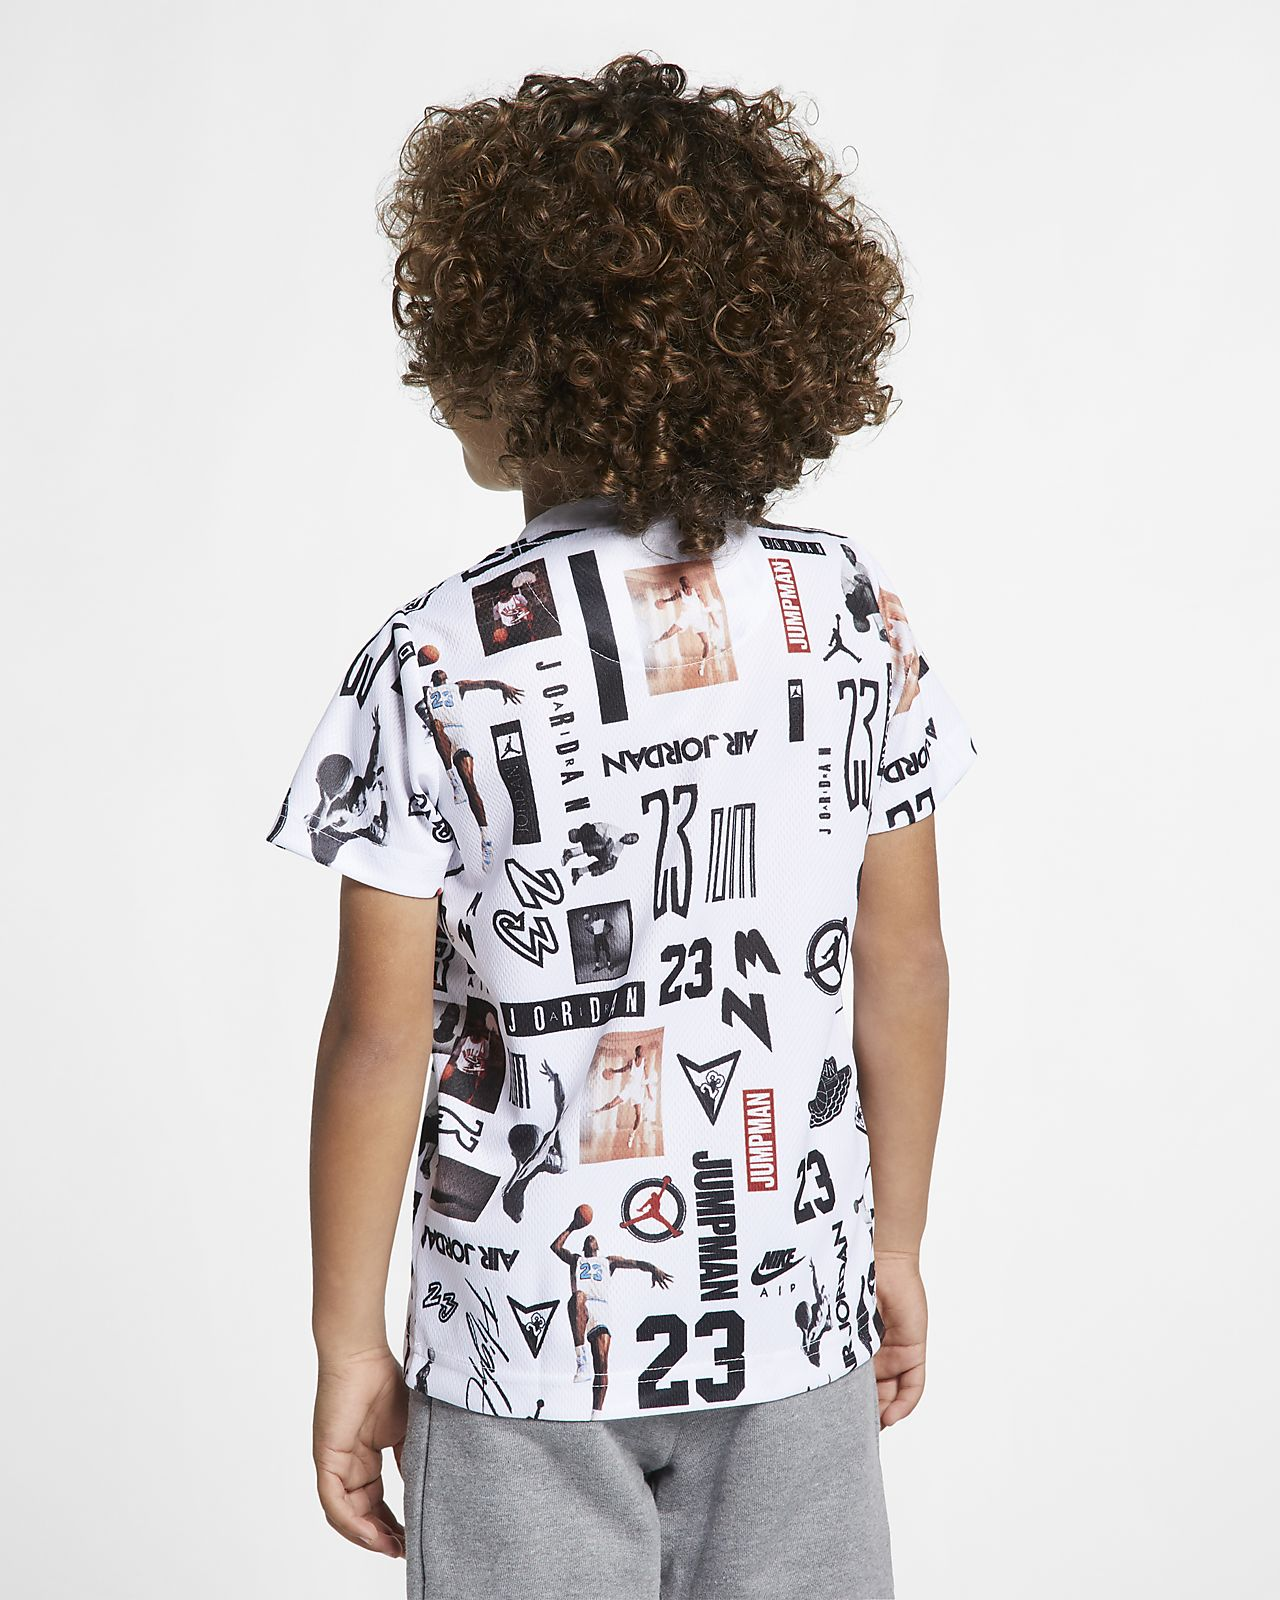 8eba36f9fd6 Jordan Sportswear Little Kids' Mesh T-Shirt. Nike.com